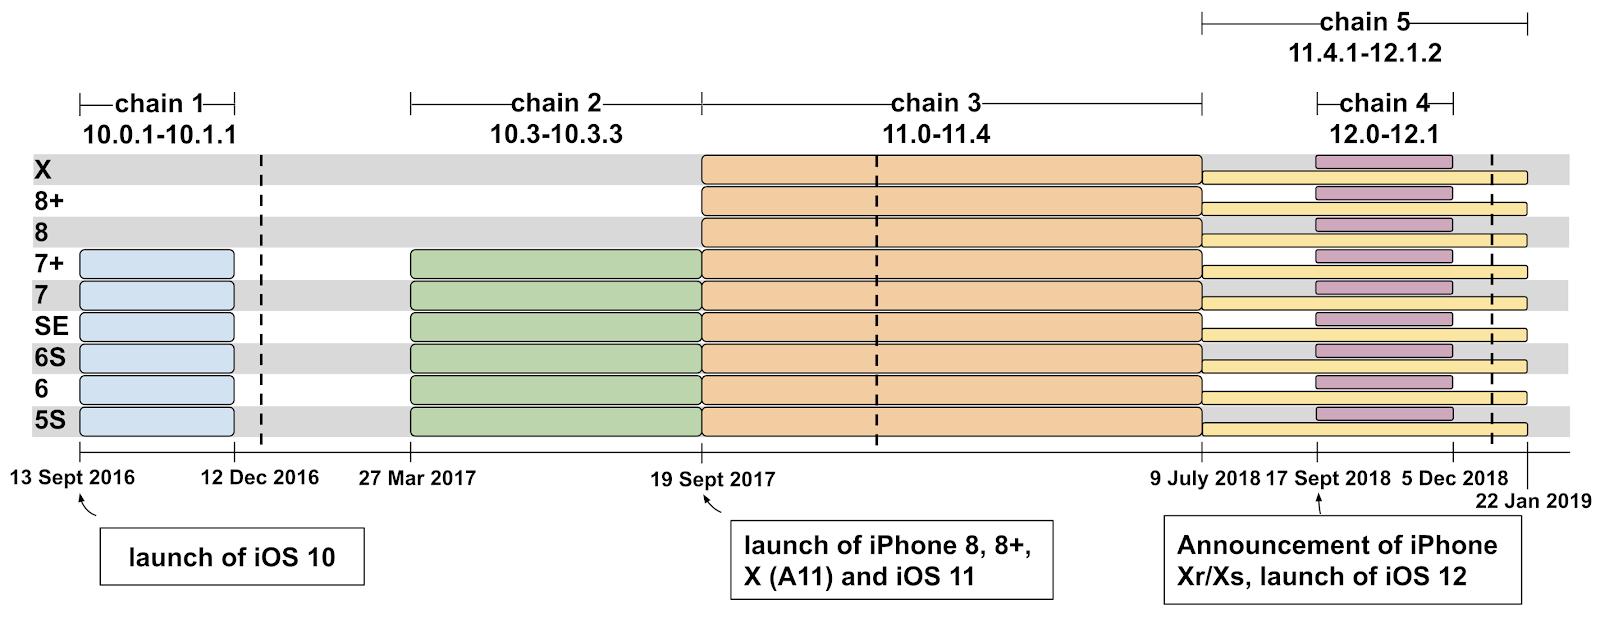 iPhone遭駭客攻擊長達多年!Google安全團隊揭漏史上最嚴重攻擊事件